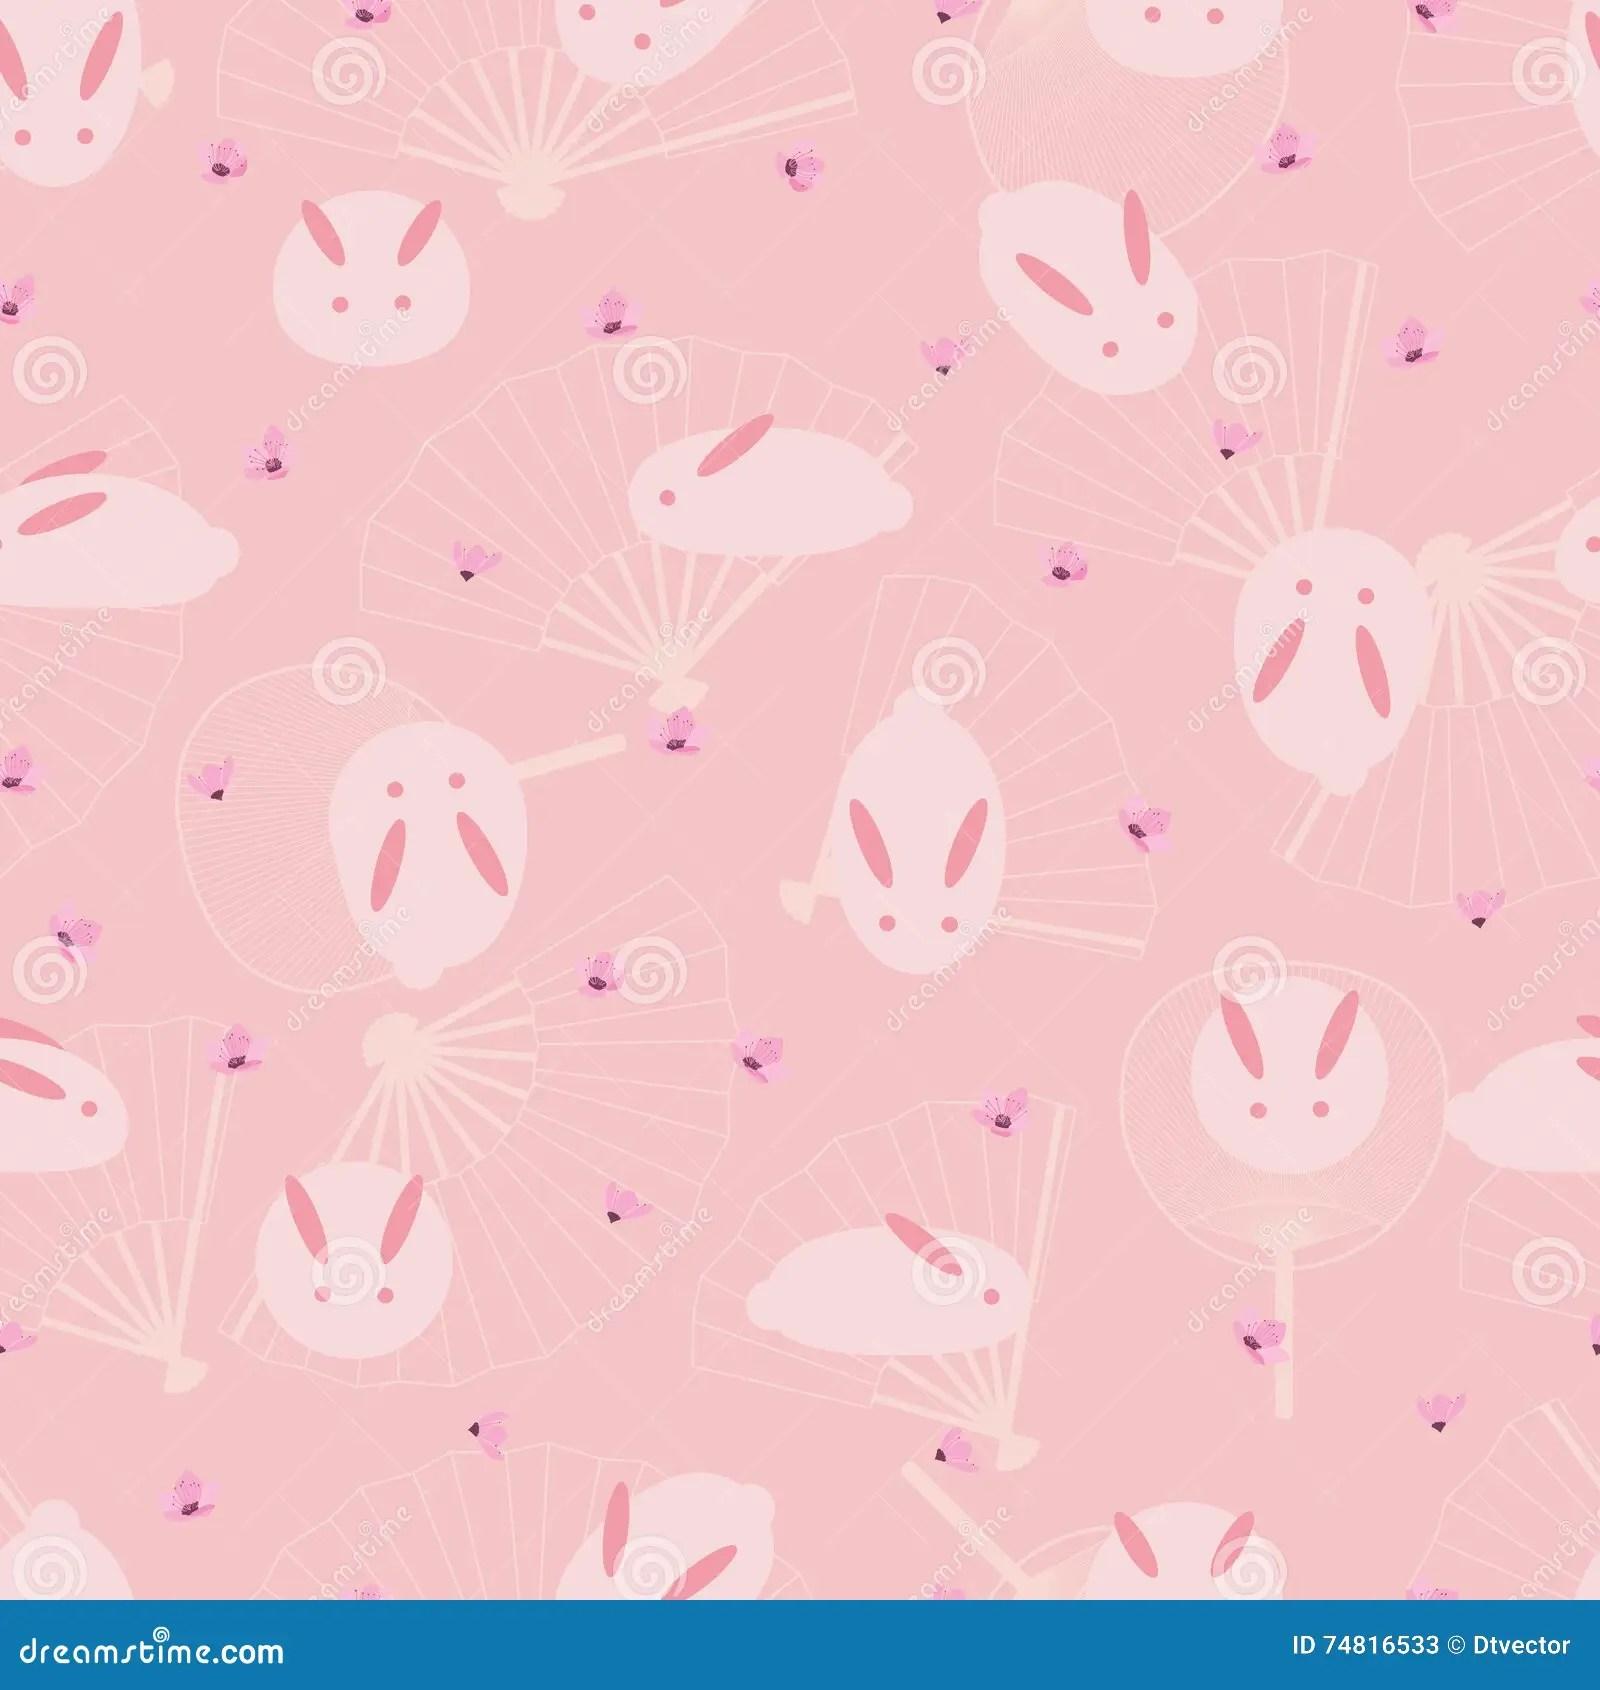 Animal Print Iphone 5 Wallpaper Japanese Rabbit Fan Pink Seamless Pattern Stock Vector